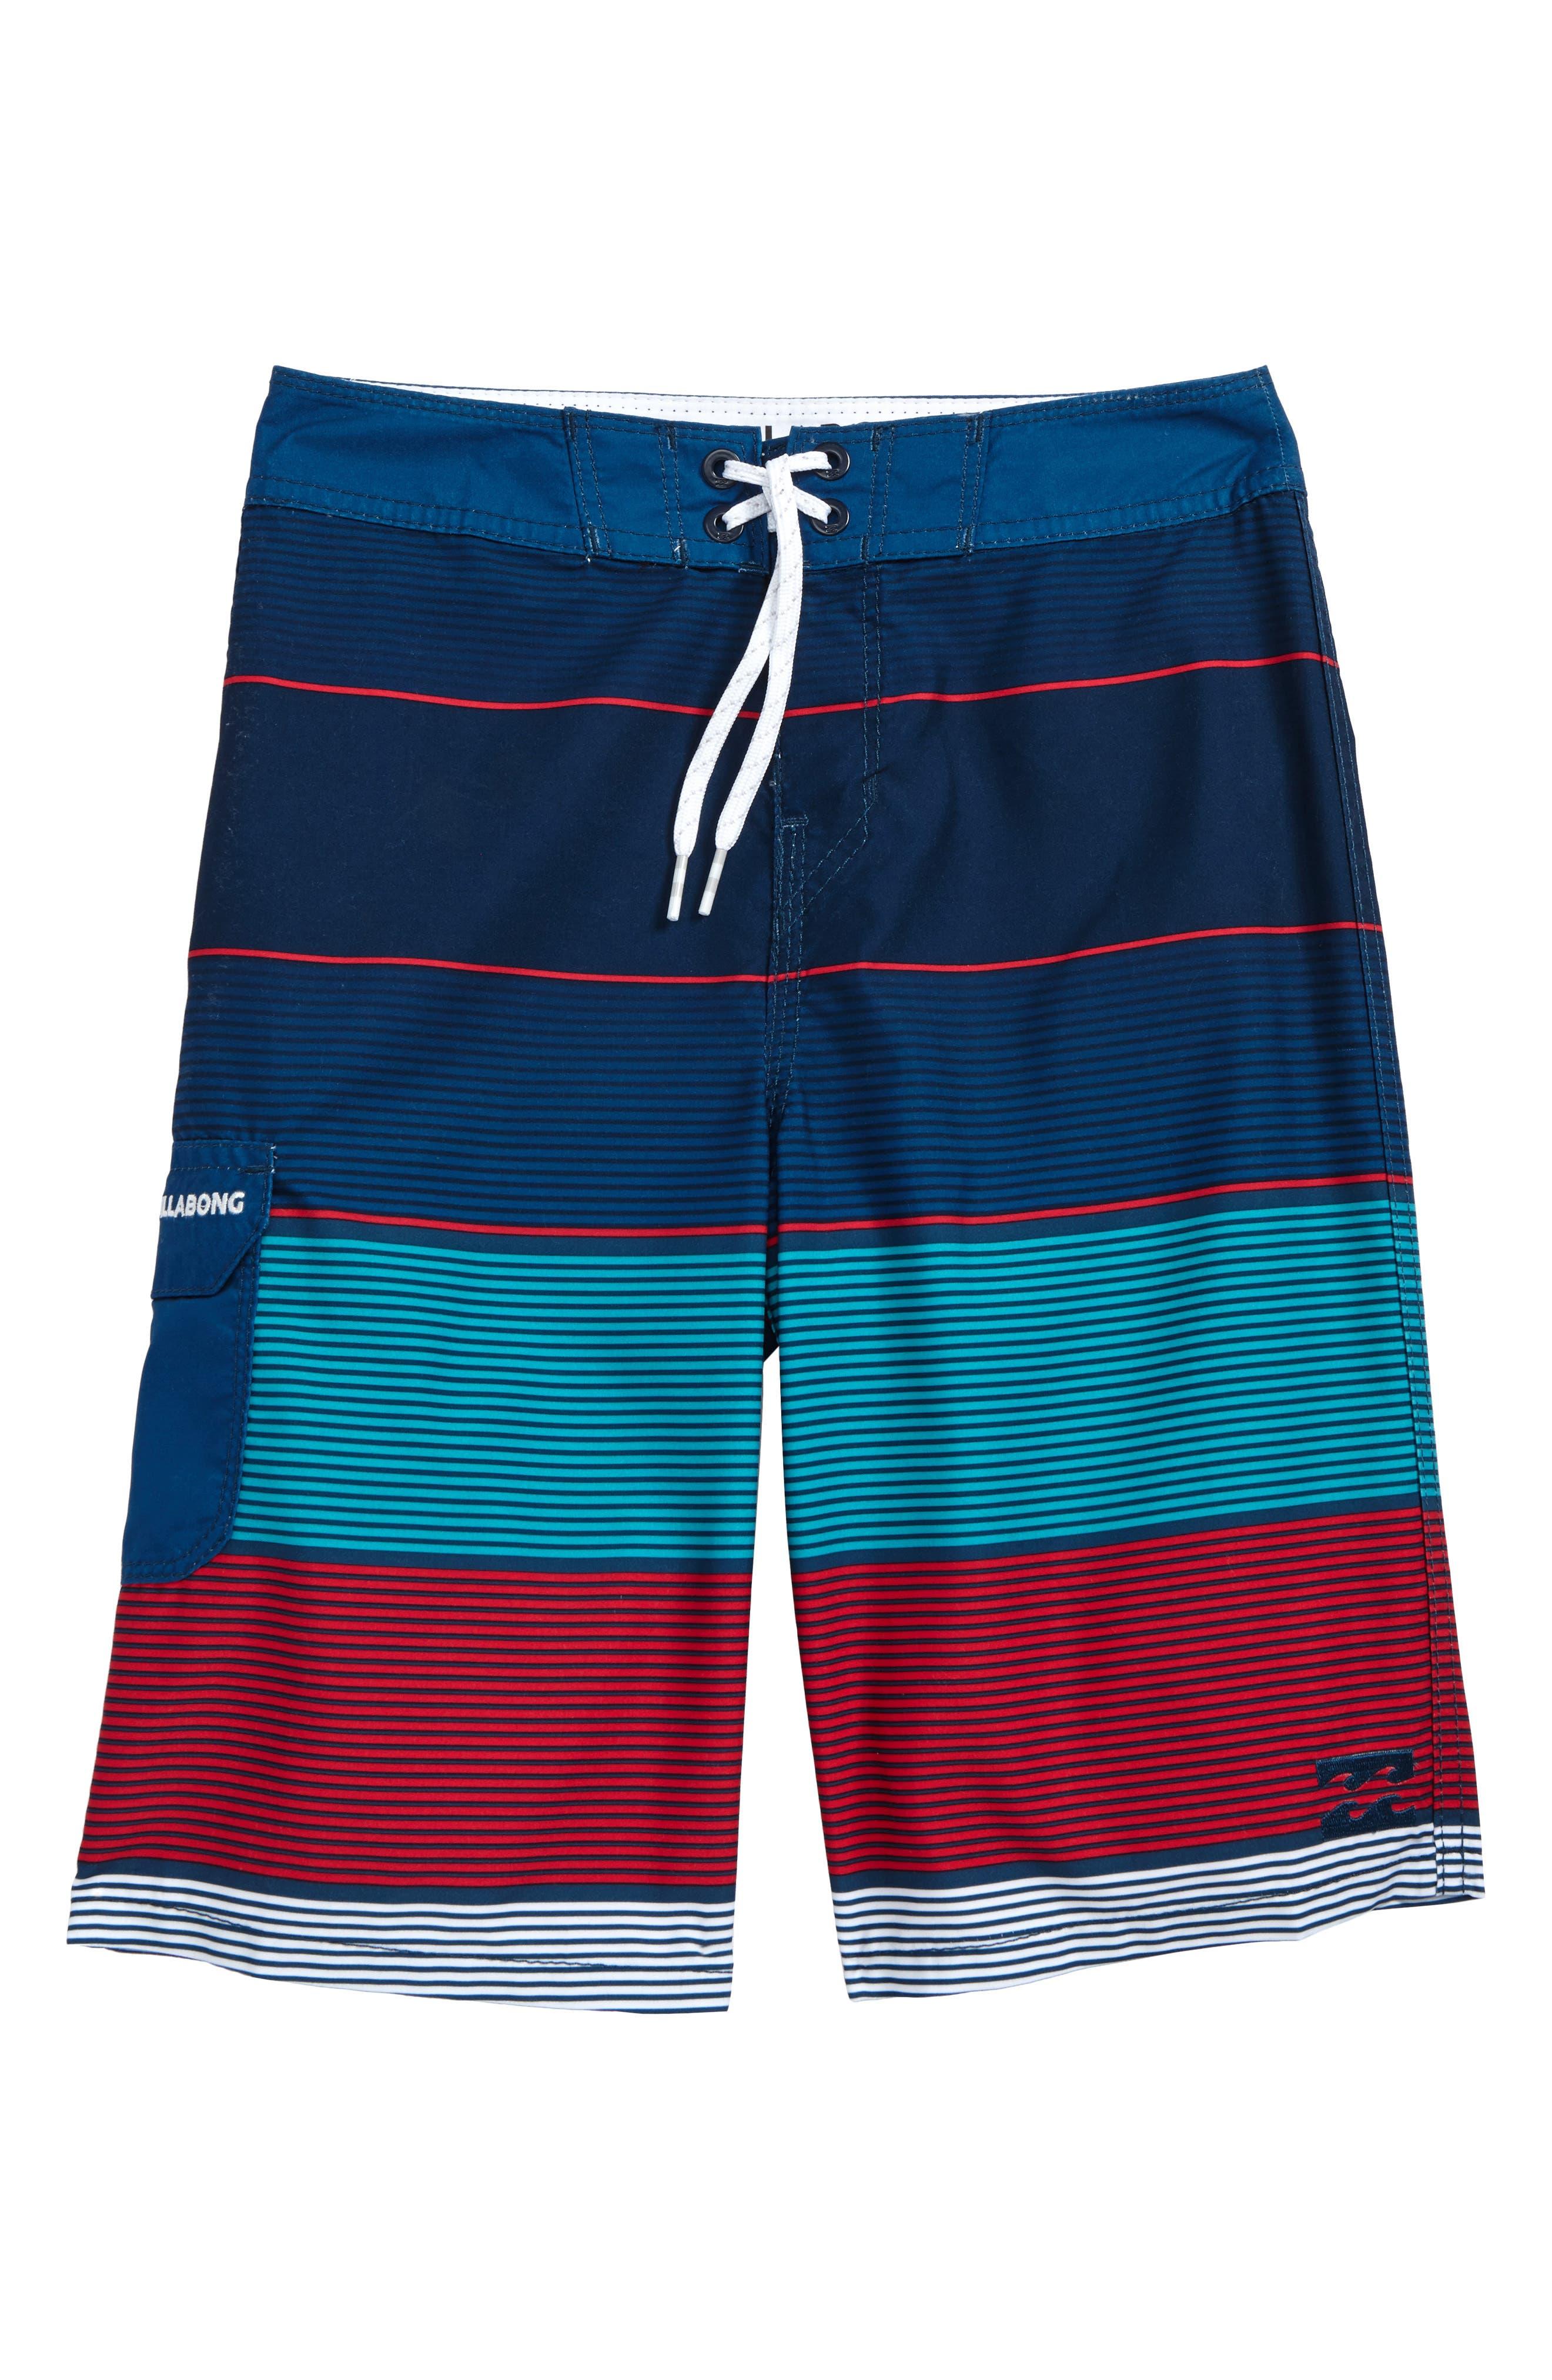 Billabong All Day OG Stripe Board Shorts (Big Boys)